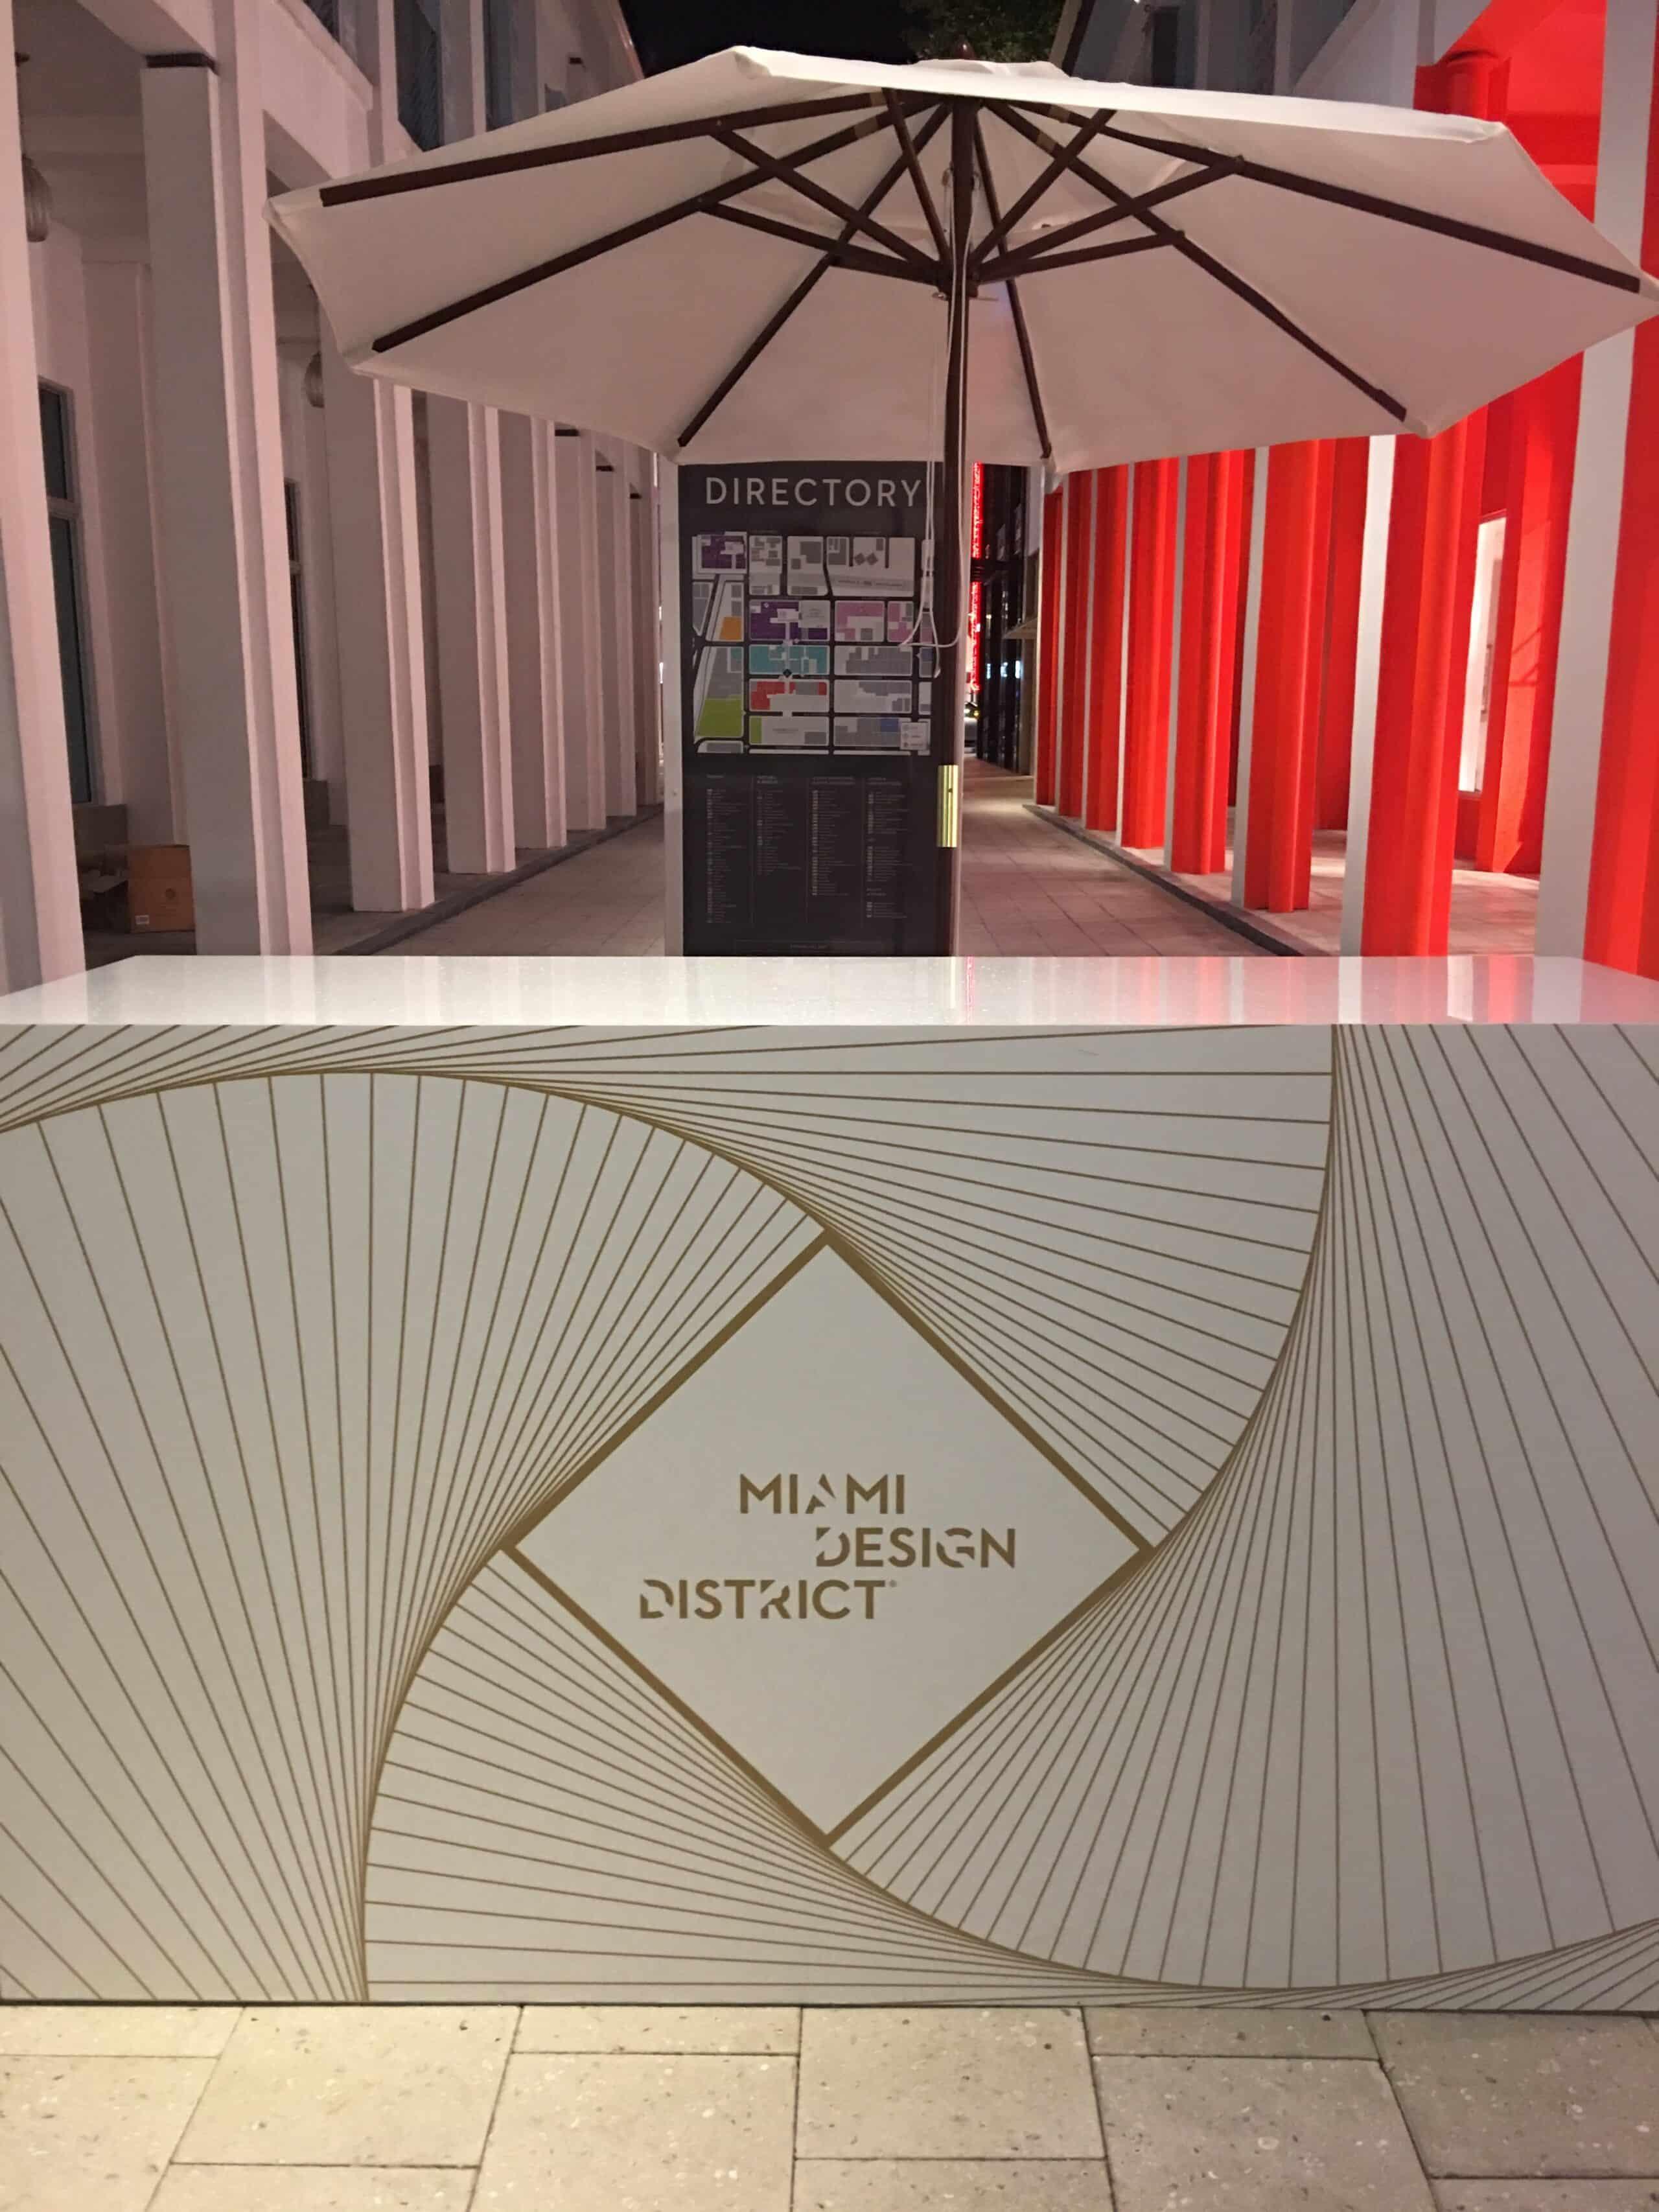 Fashion Capital Of Miami